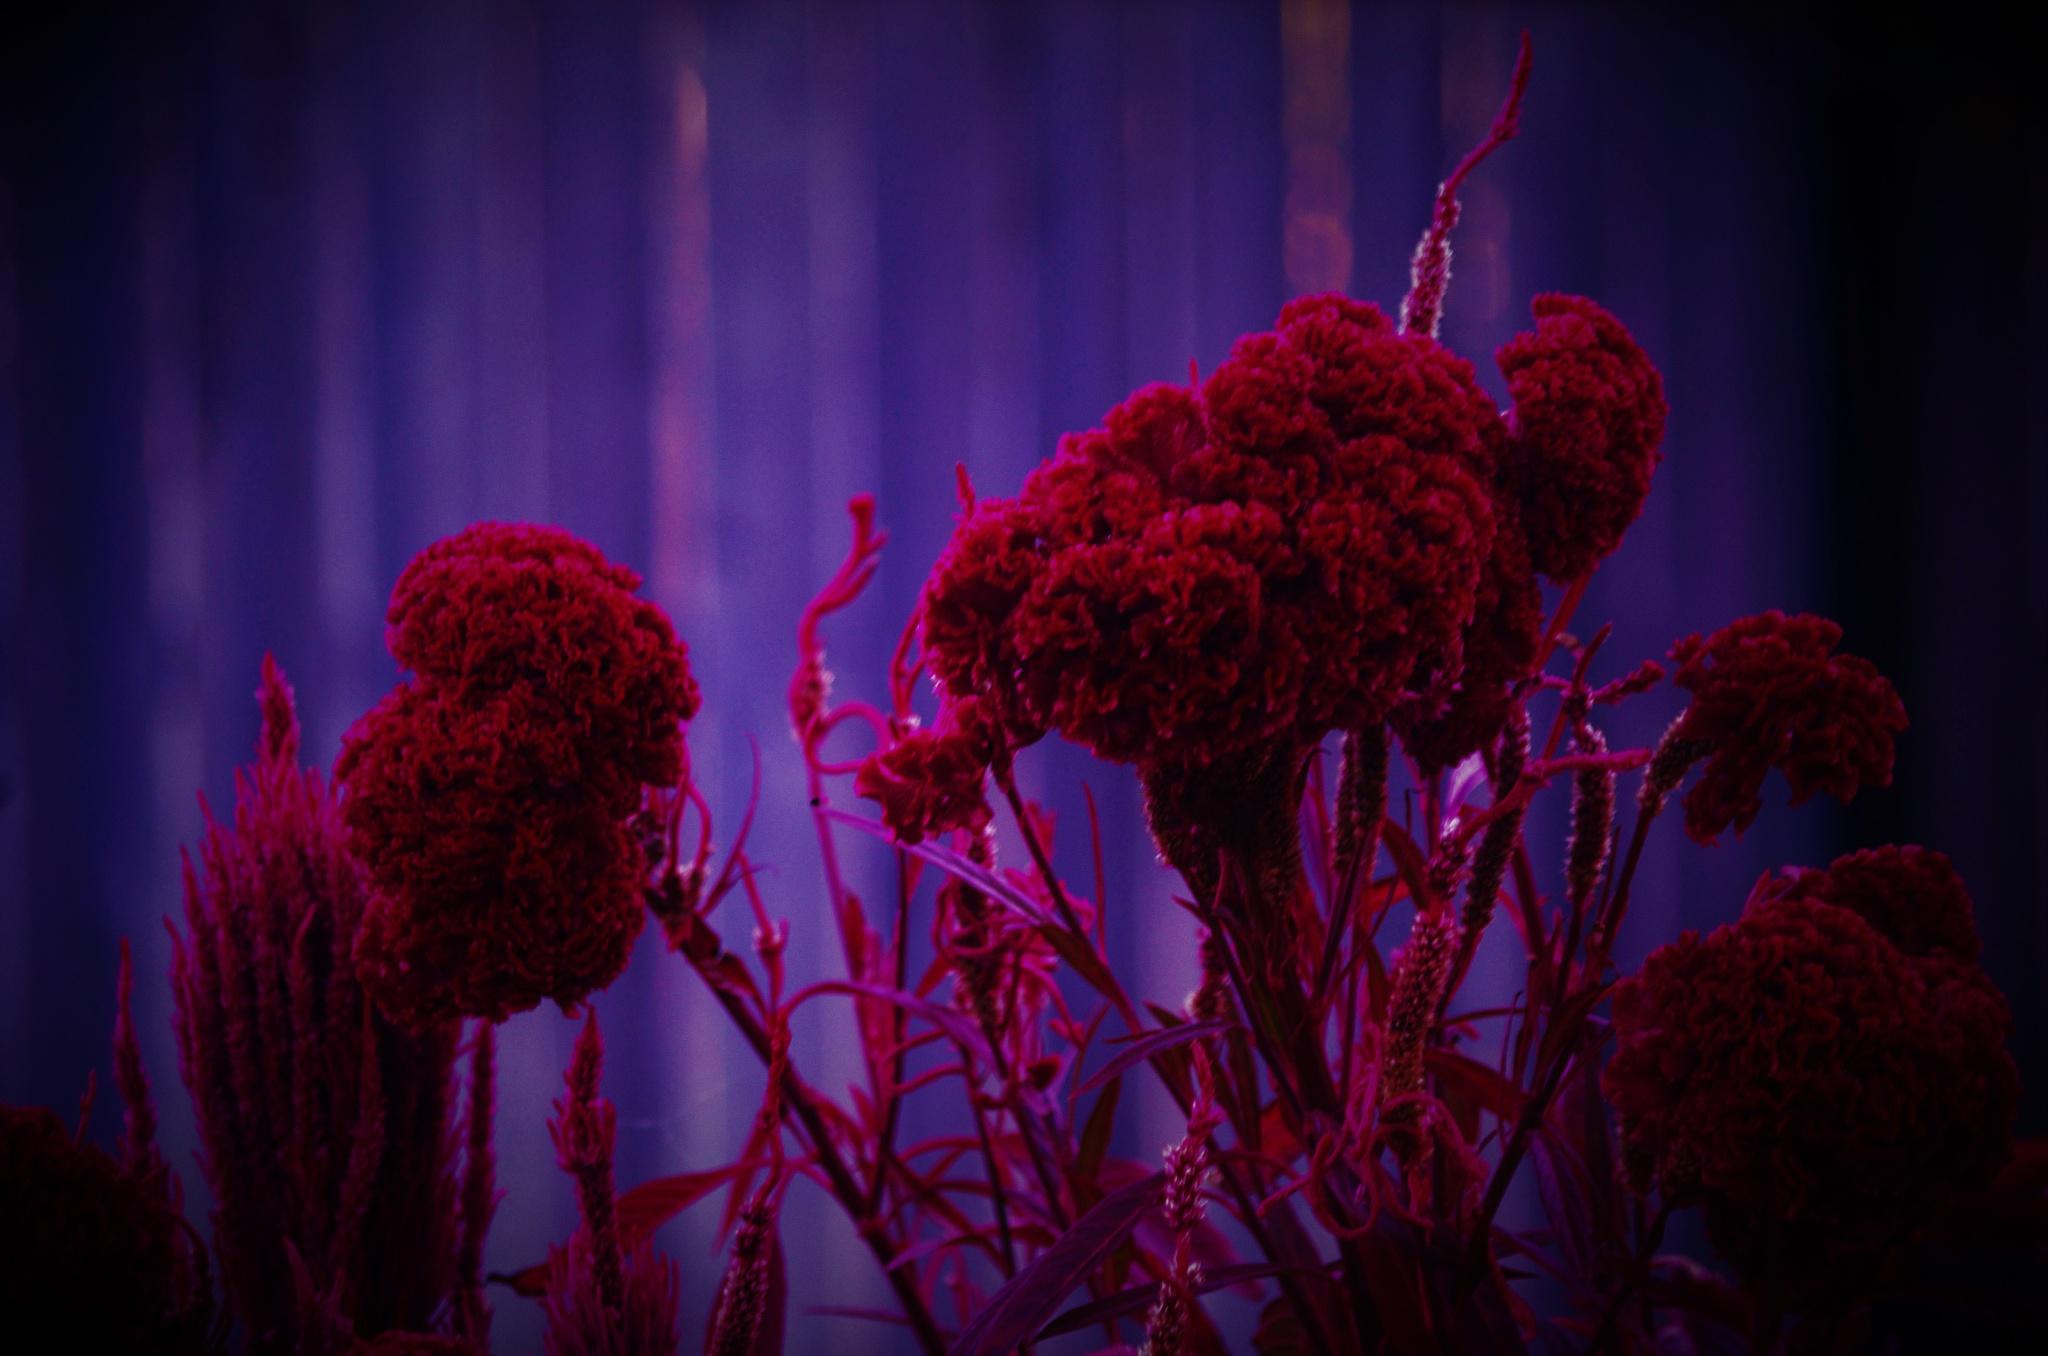 redflowers by david8900